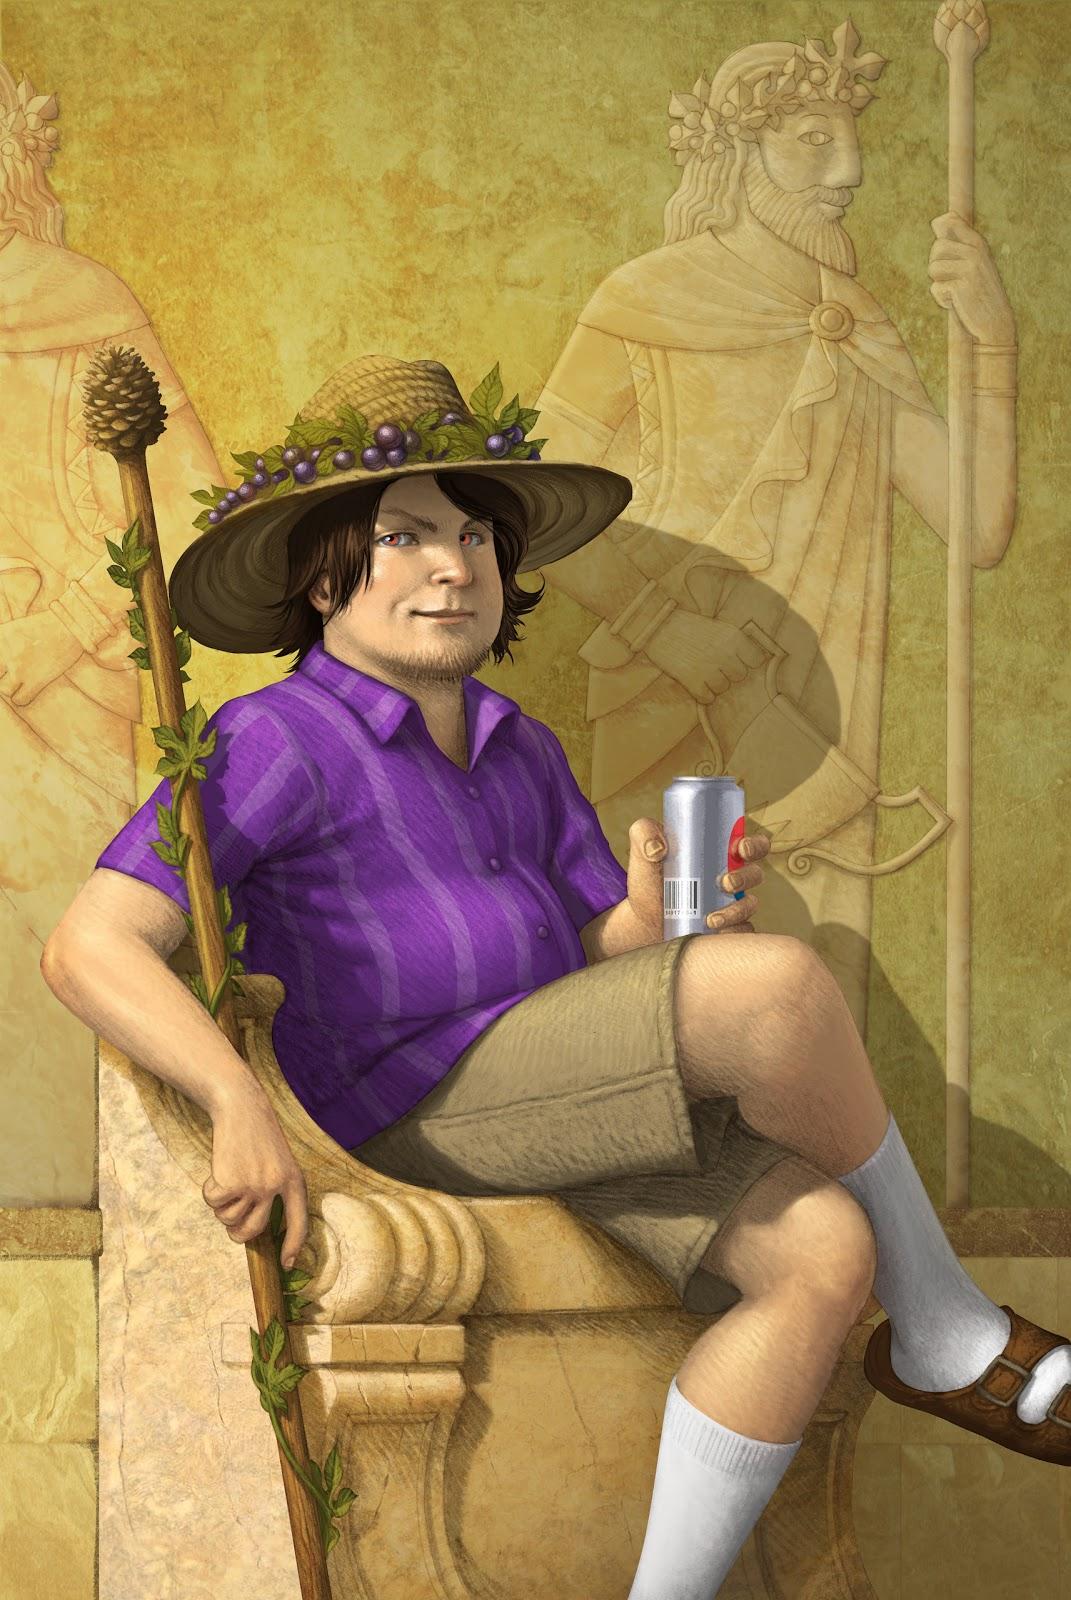 Myth & Mystery: God Alert! It's the Wine Dude!